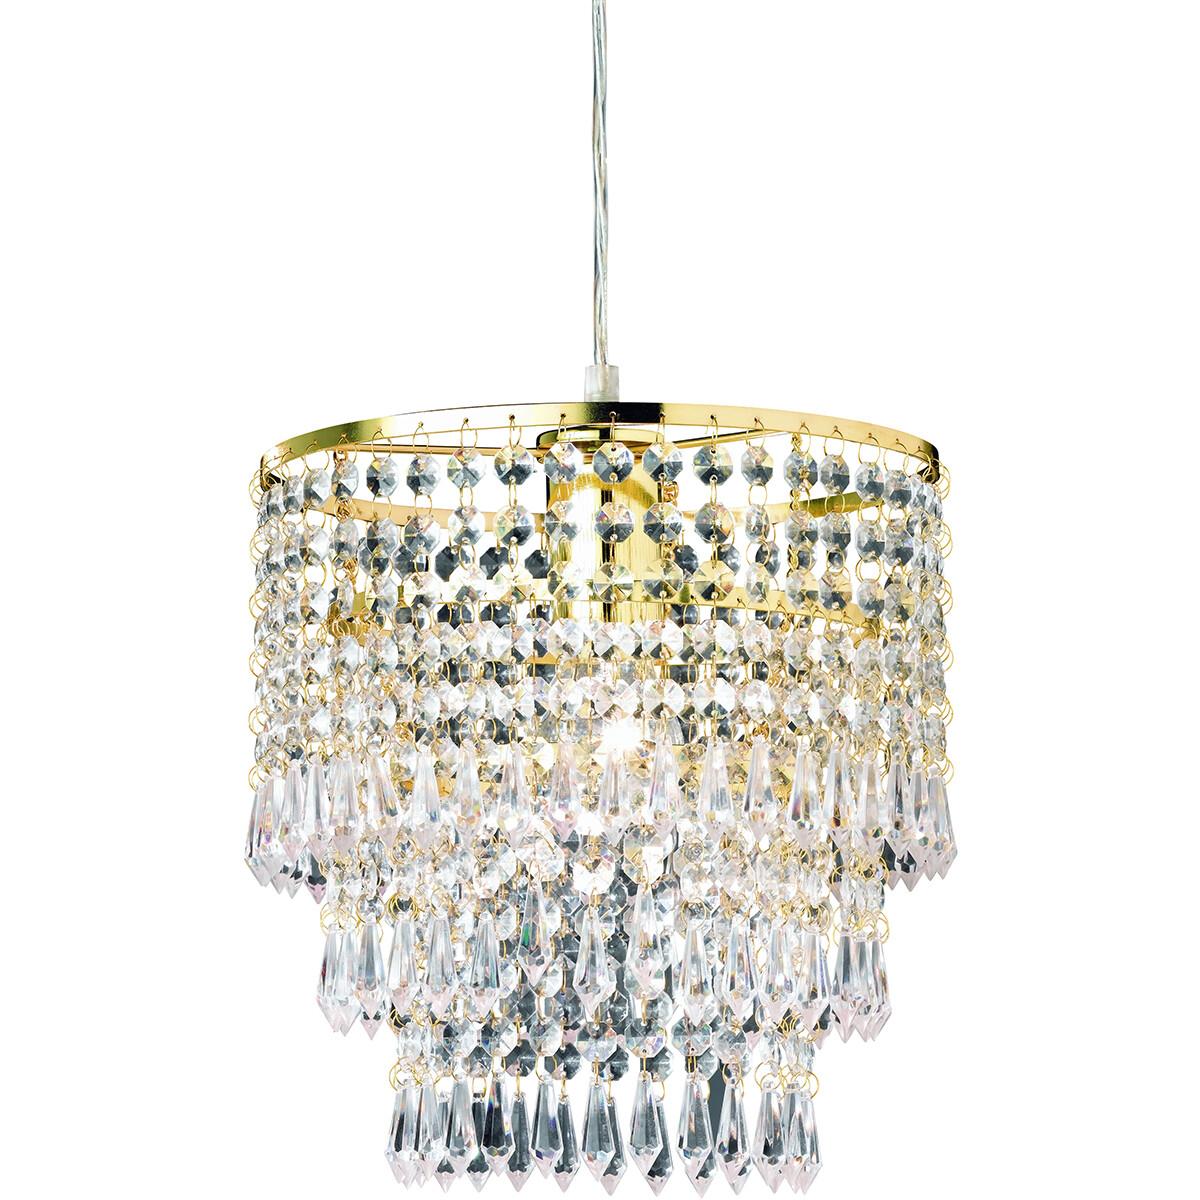 LED Hanglamp - Hangverlichting - Trion Oranta - E27 Fitting - 1-lichts - Rond - Mat Goud - Aluminium